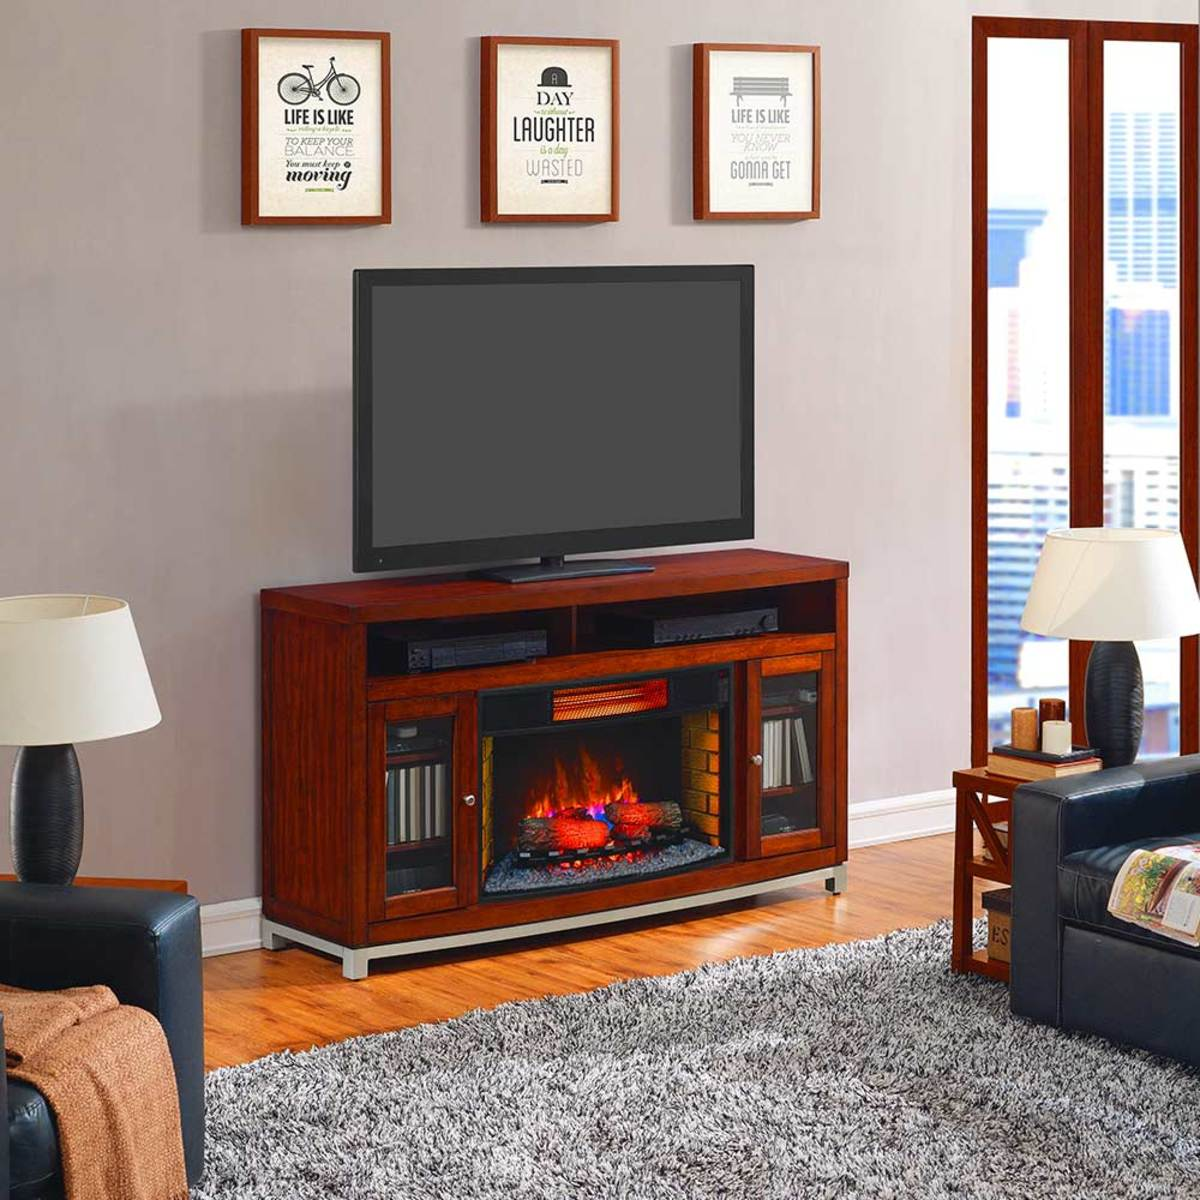 Twinstar 32 吋壁爐暖器電視櫃